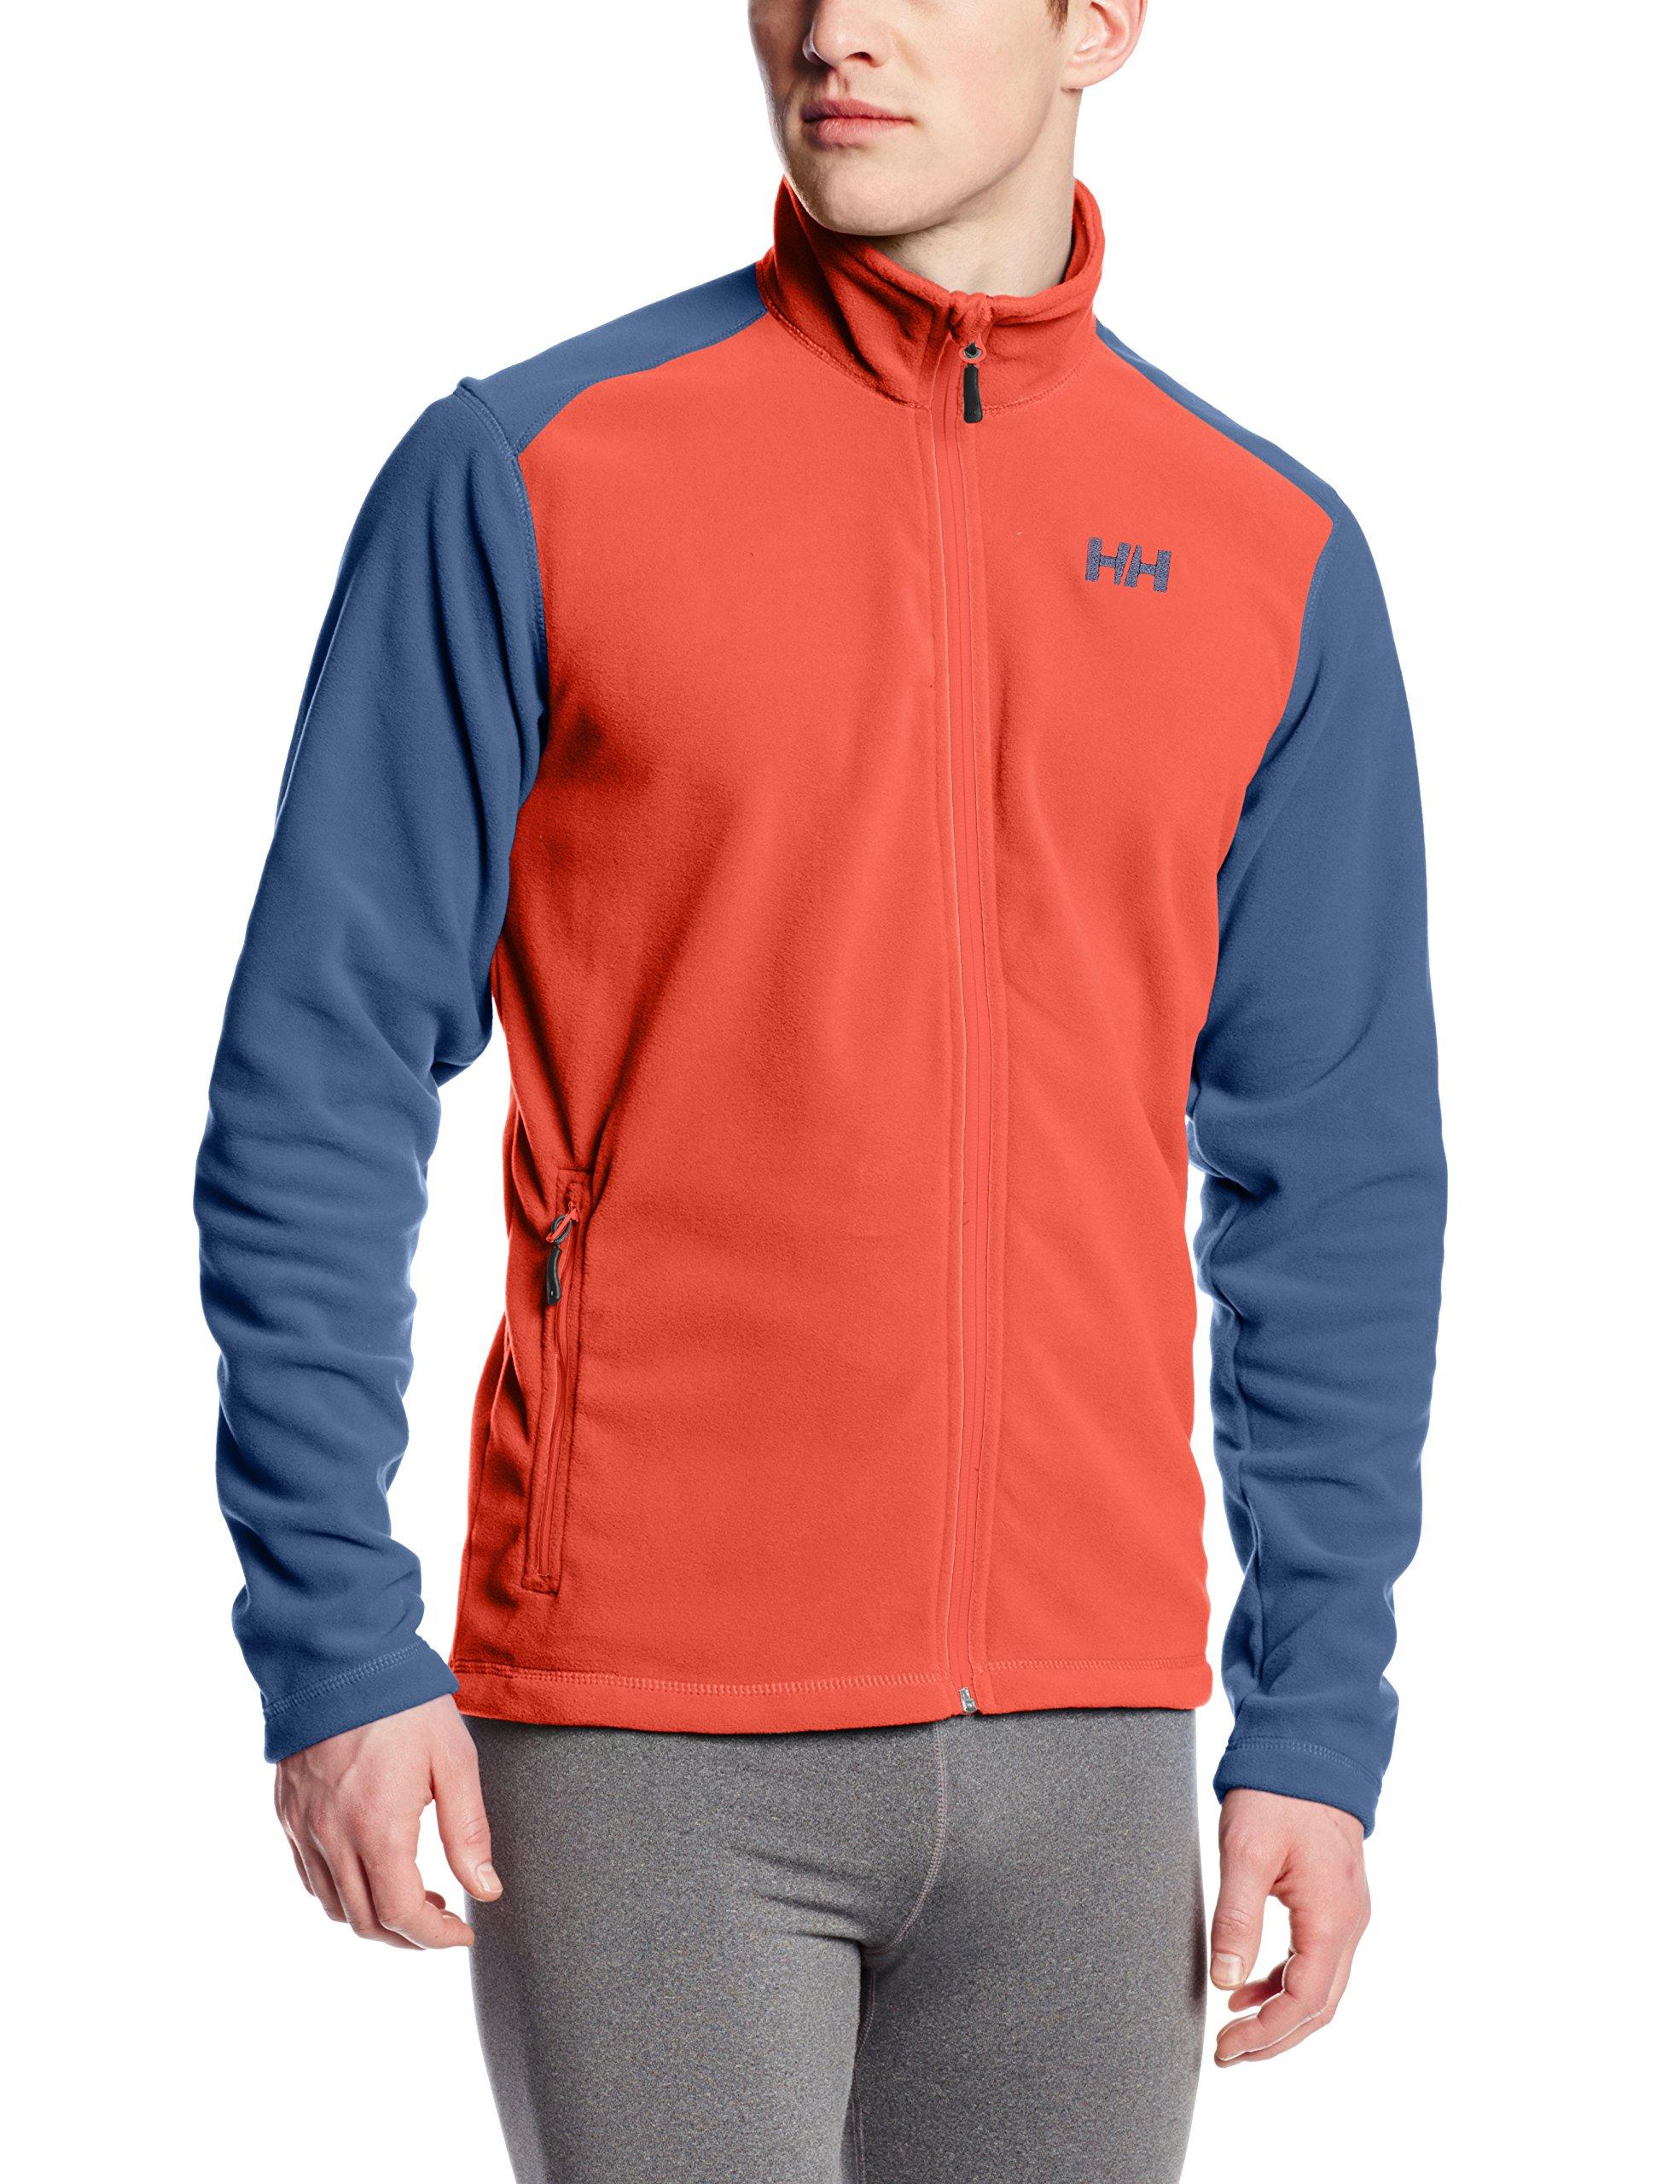 Helly Hansen Men's Daybreaker Lightweight Full Zip Fleece Jacket, 118 Paprika, Large